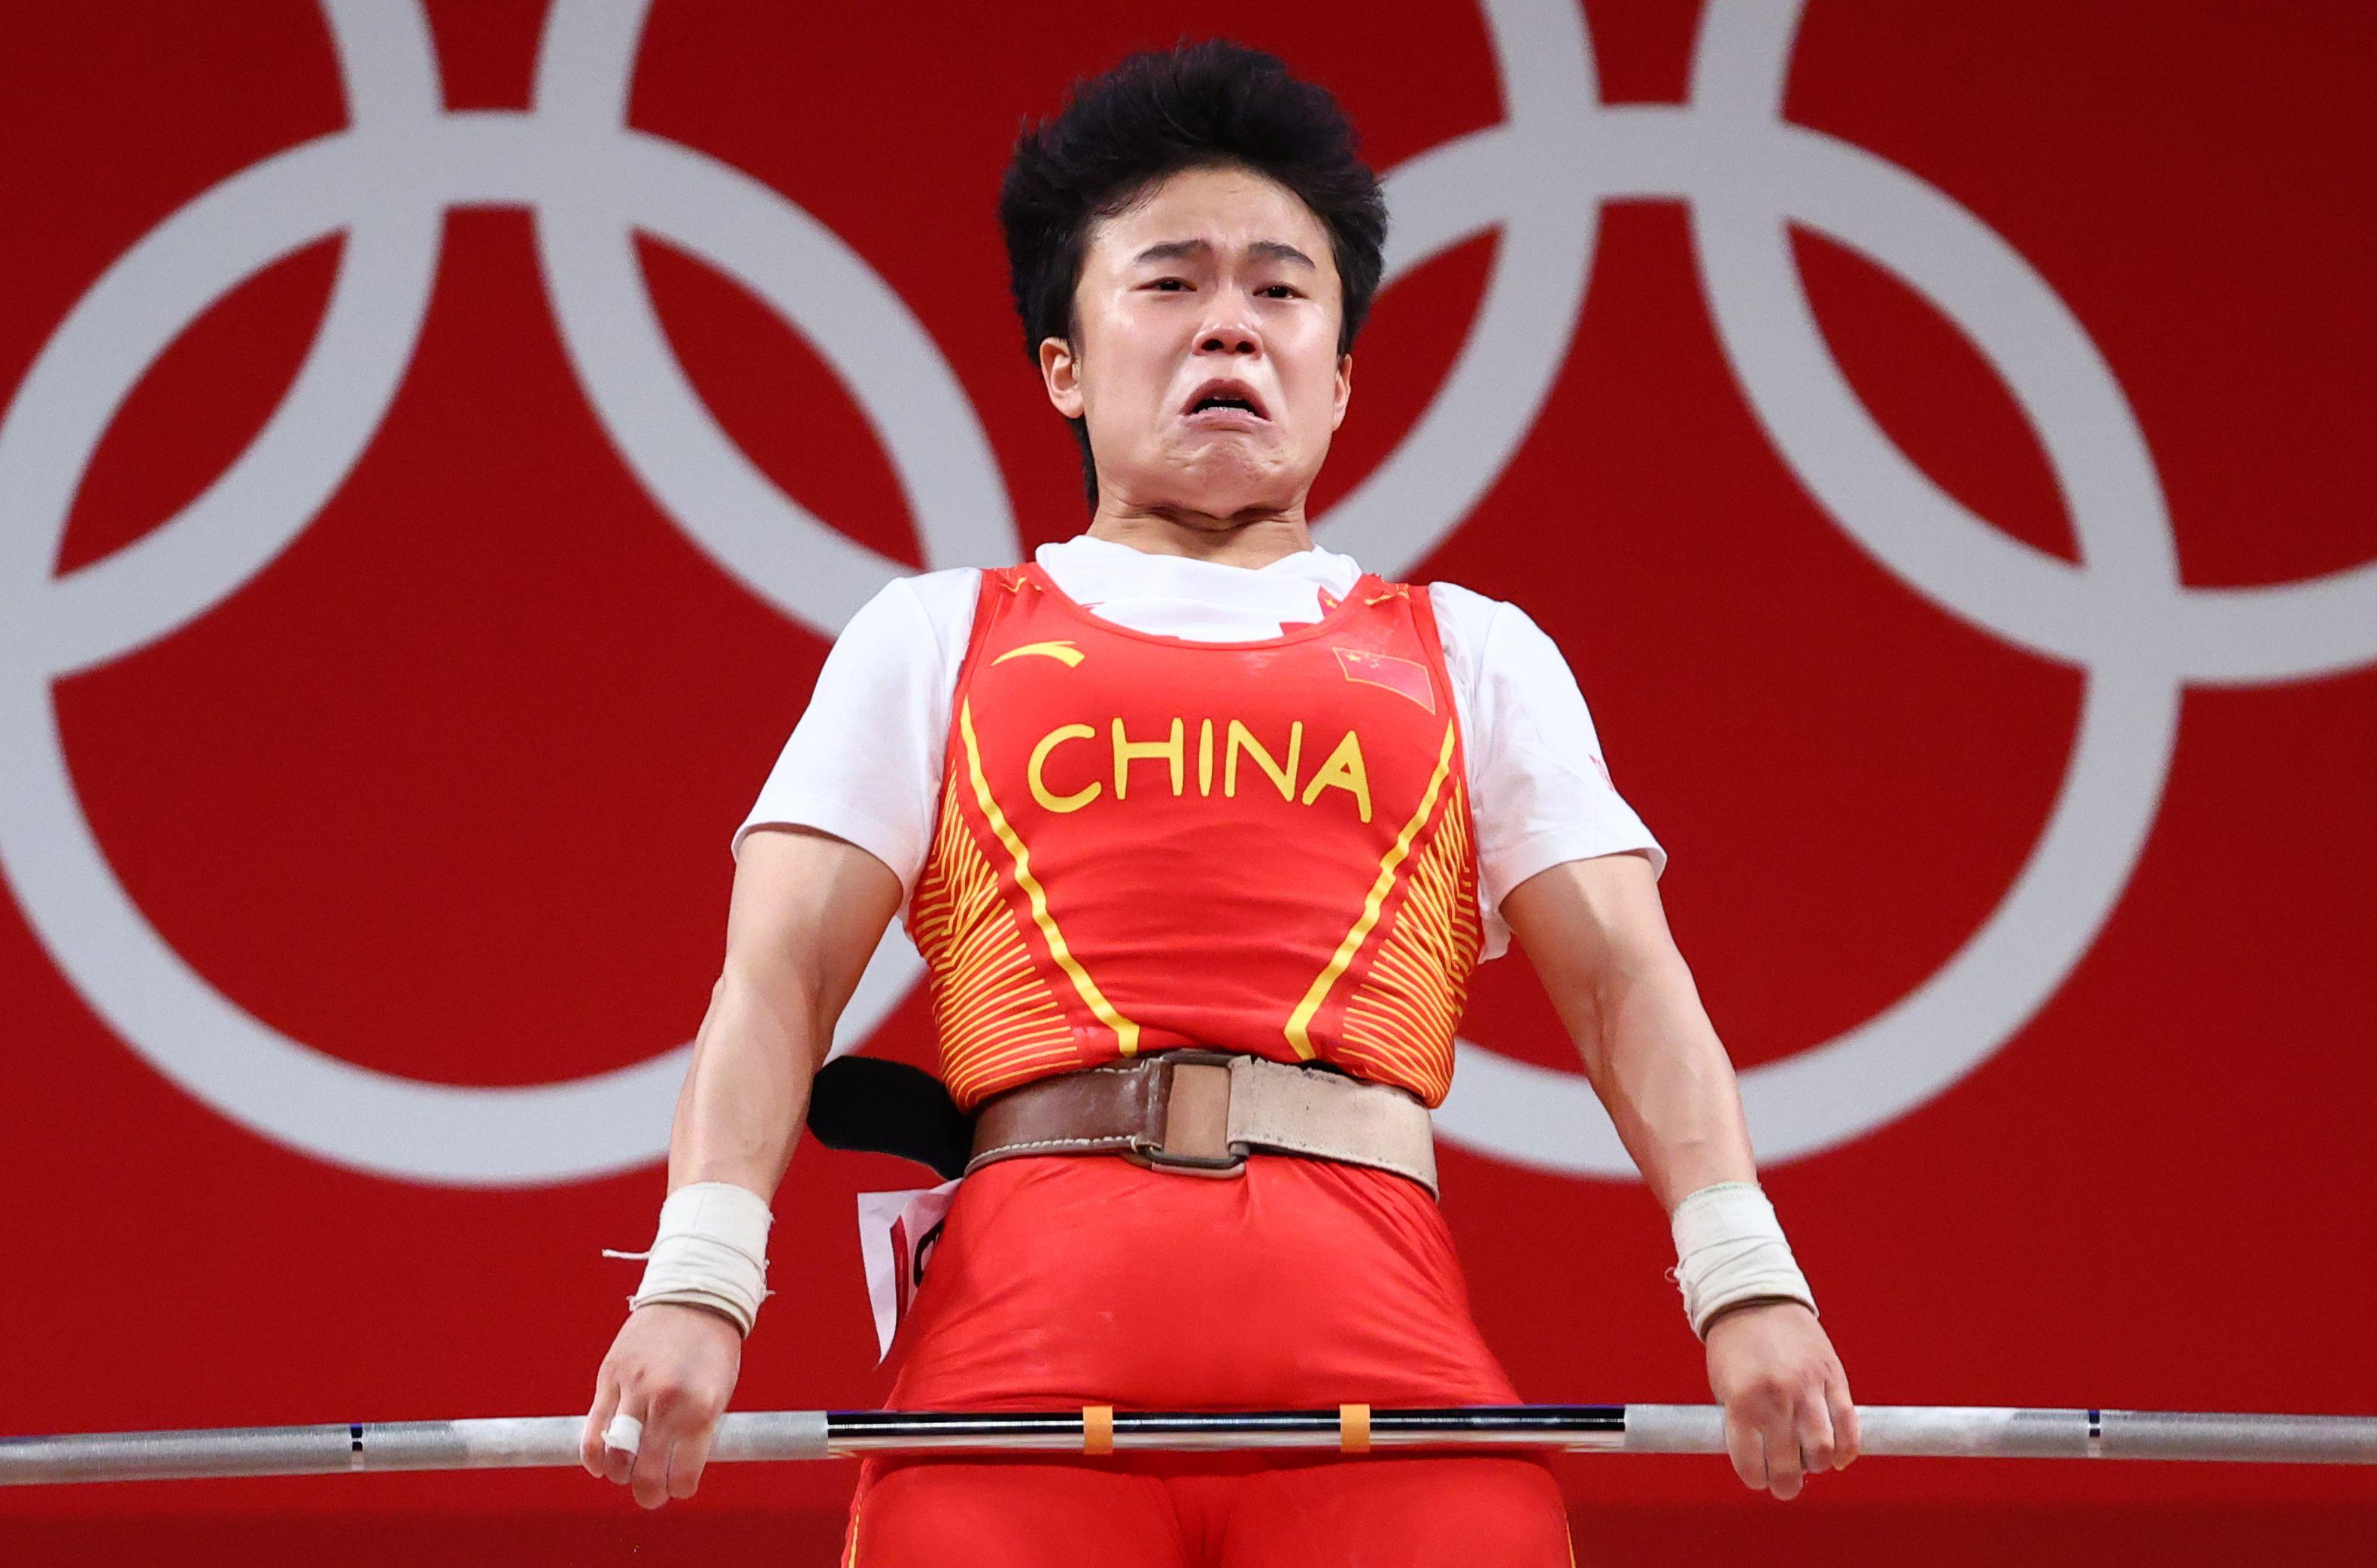 Tokyo 2020 Olympics - Weightlifting - Women's 49kg - Group A - Tokyo International Forum, Tokyo, Japan - July 24, 2021.  Hou Zhihui of China in action. REUTERS/Edgard Garrido